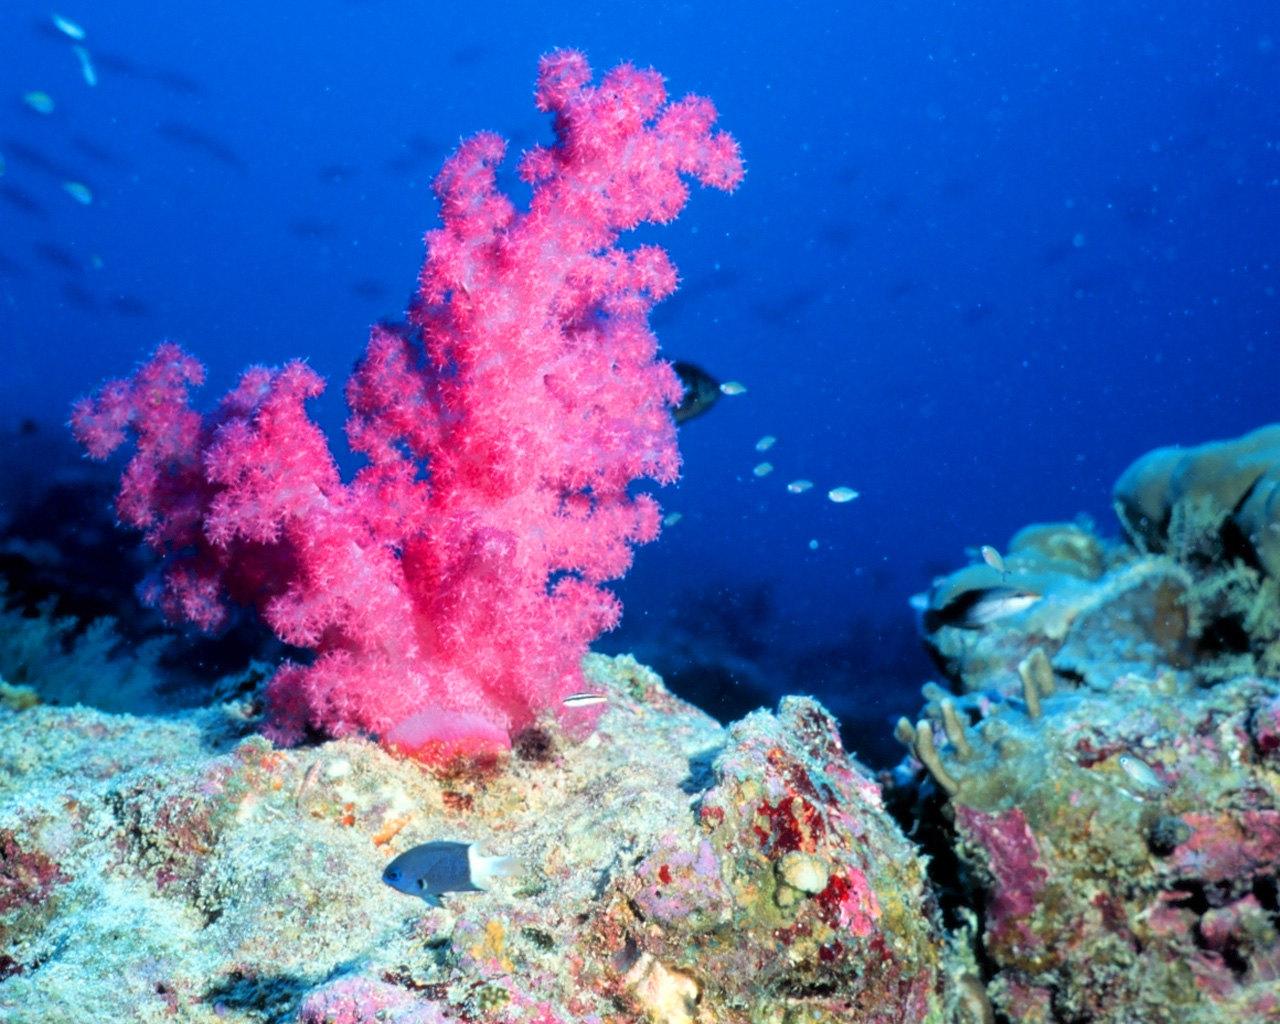 Картинка с кораллами